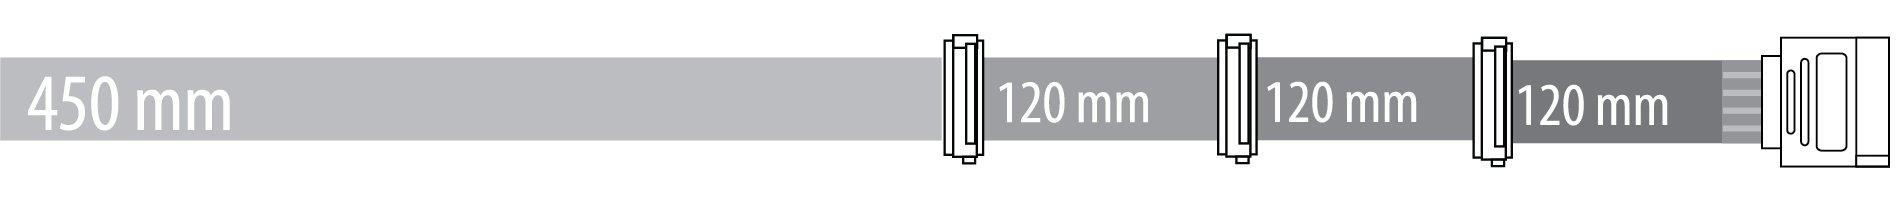 SATA 450 + 120 + 120 + 120 mm